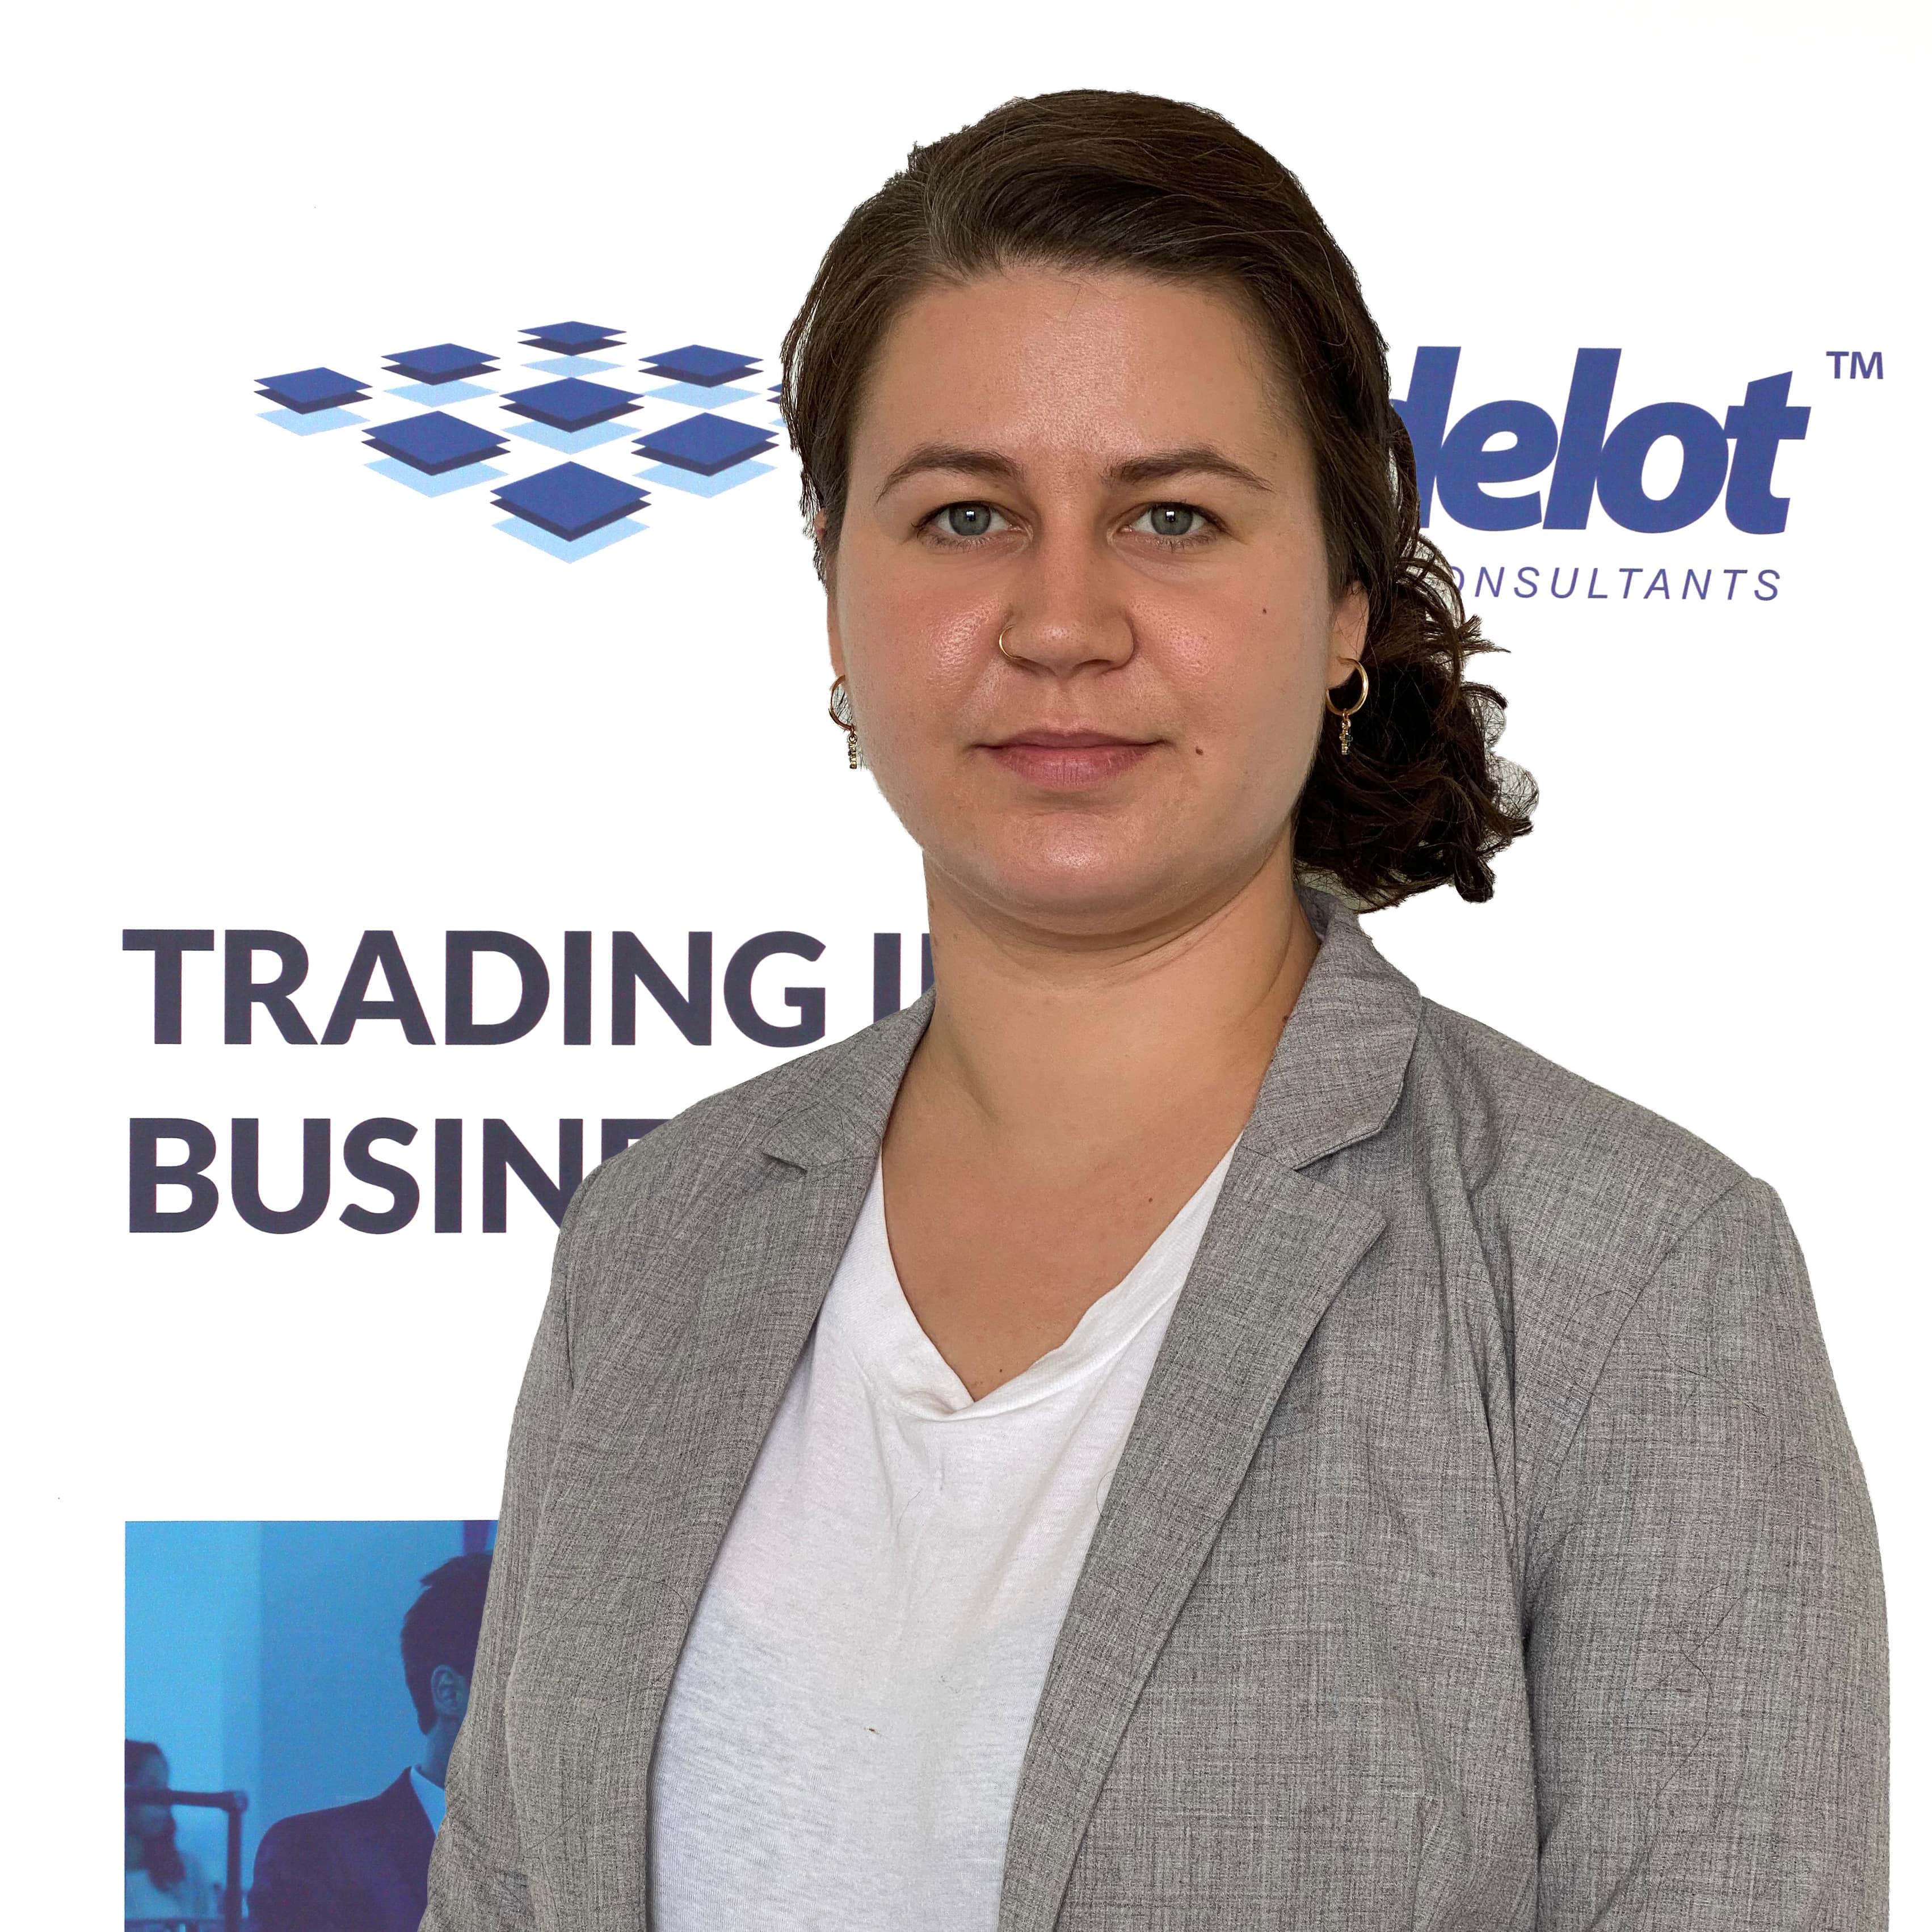 Partner Coordinator Aleksandra Rzadkowska